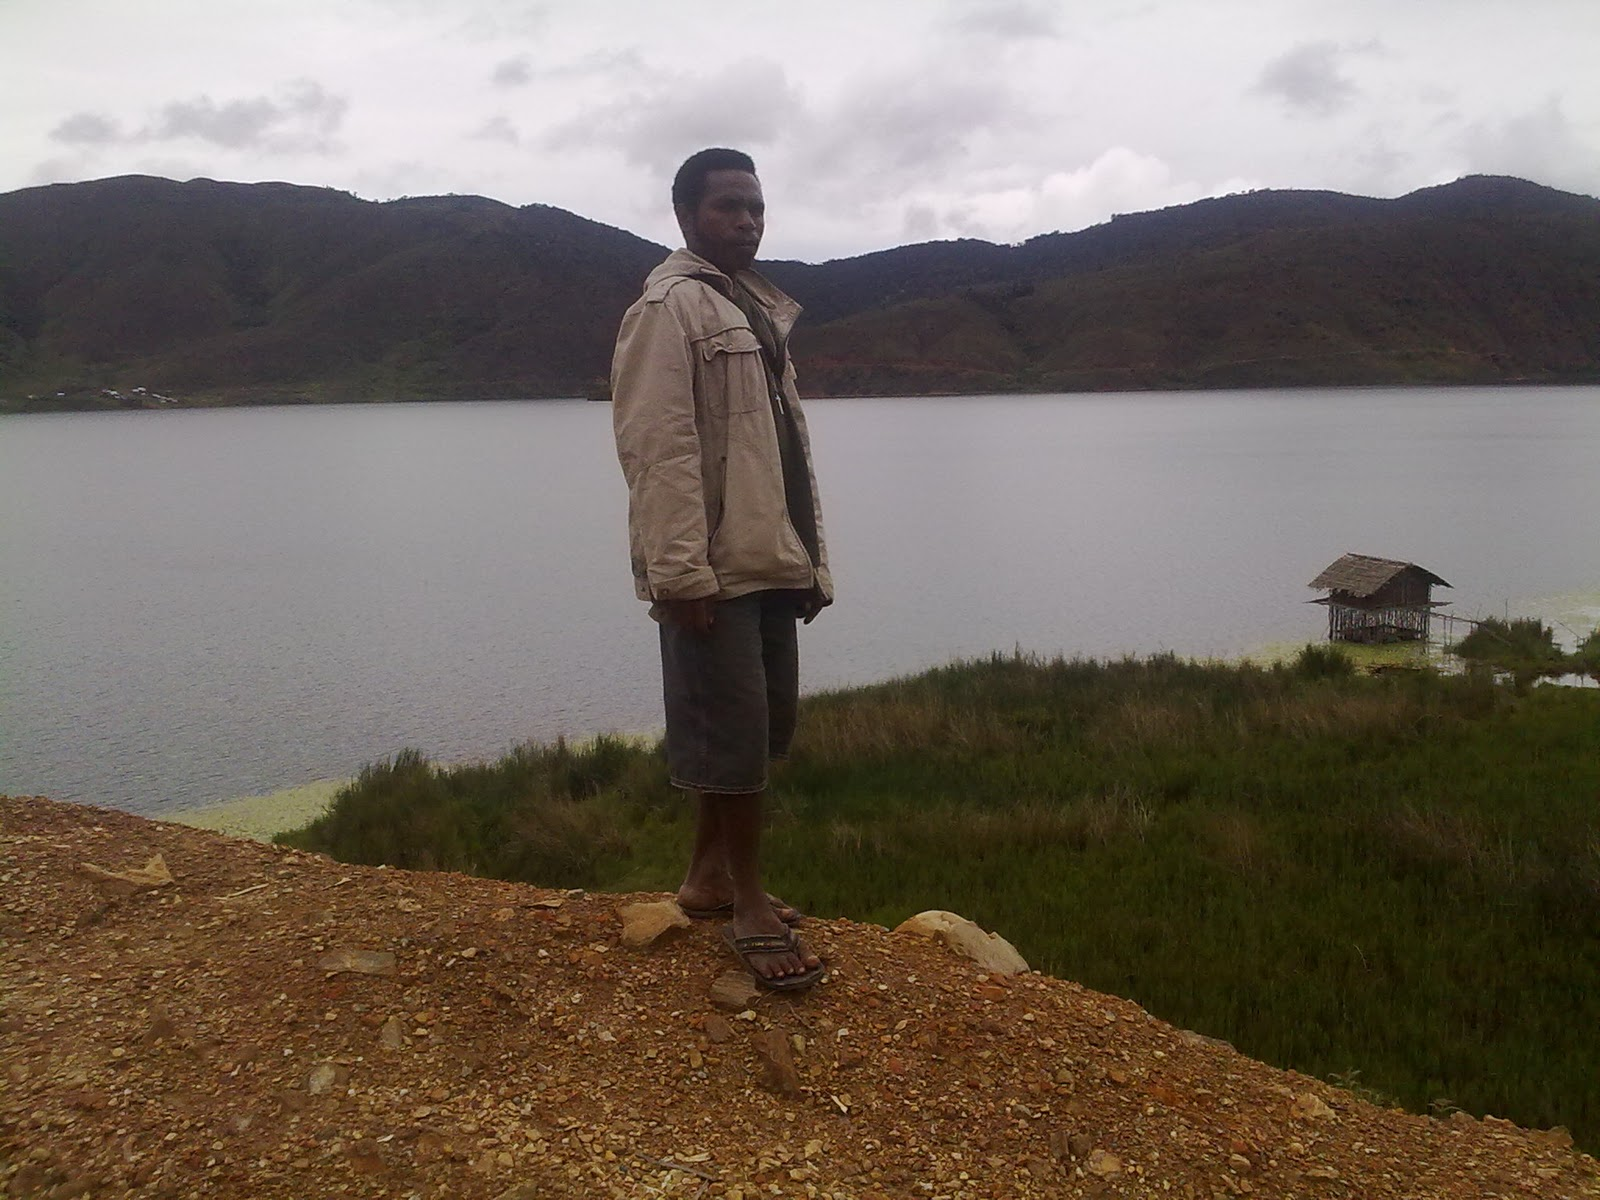 Blak Jopie Saiba Pegunungan Arfak Manokawri Cagar Alam Papua Barat